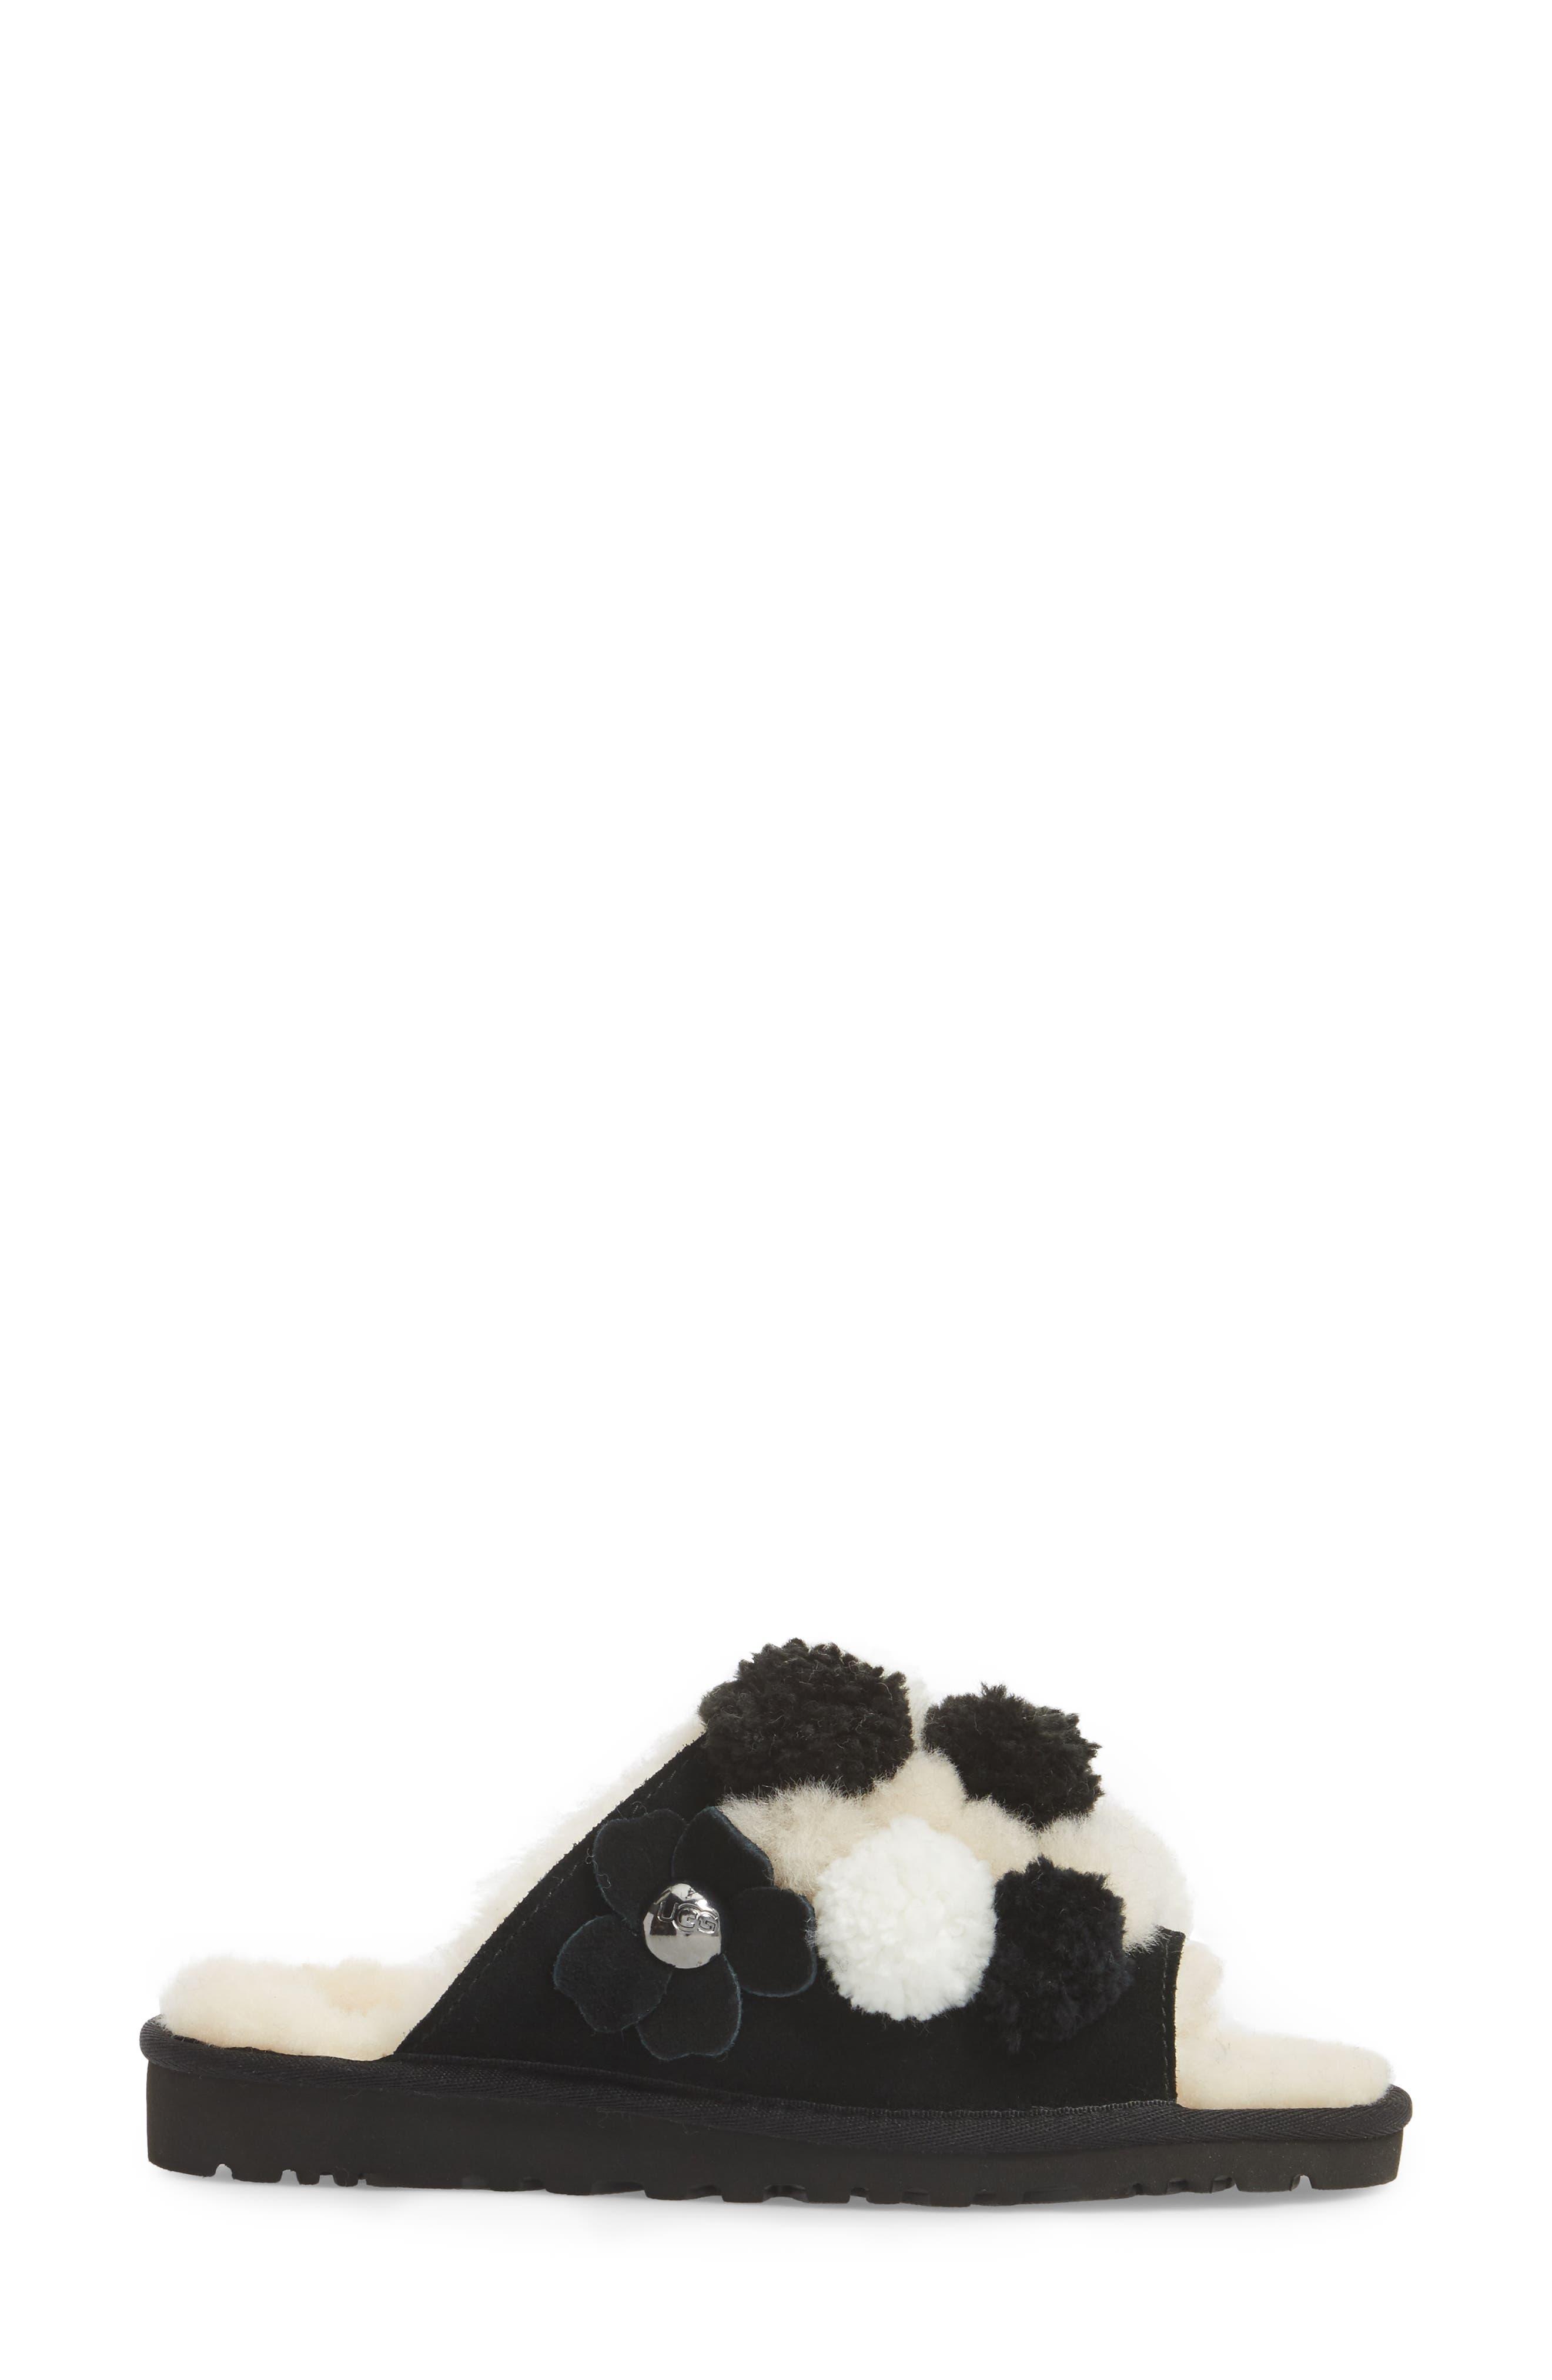 Clio Pom Pom Slide Sandal,                             Alternate thumbnail 3, color,                             Black Suede